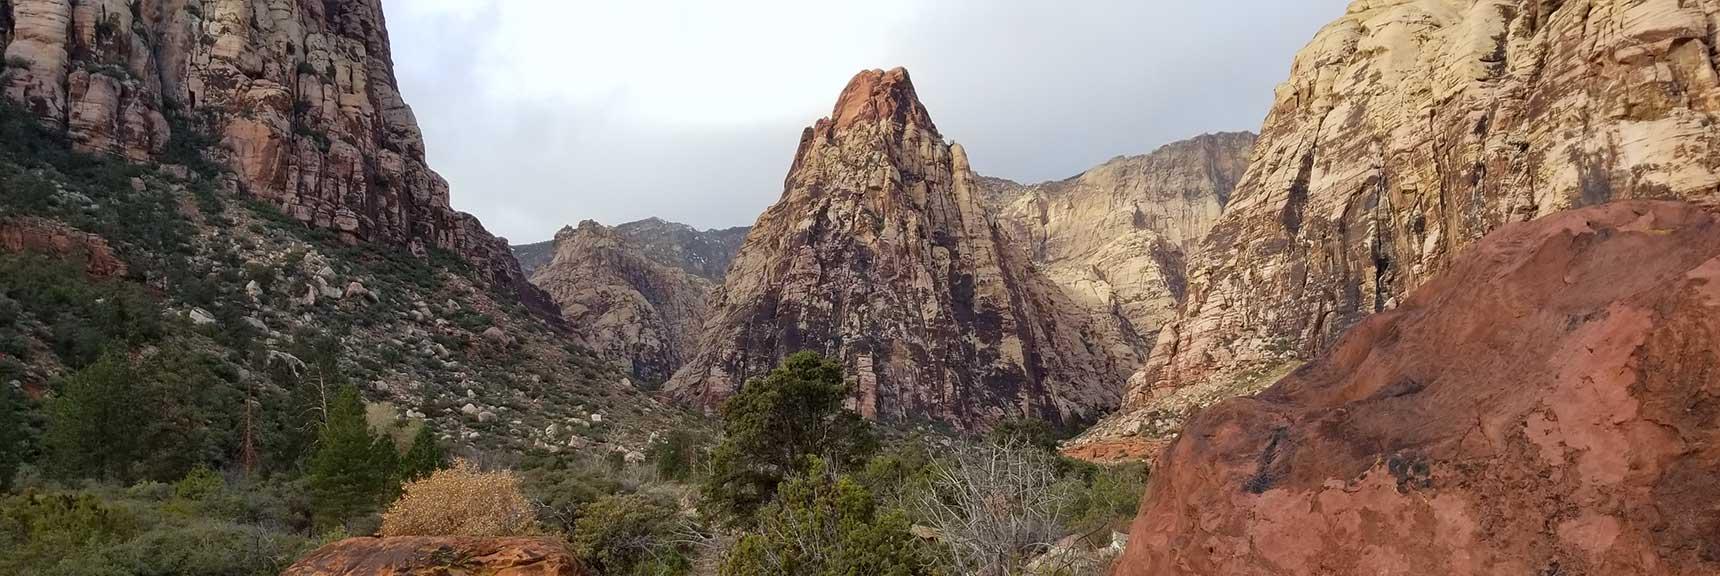 Mescalito Peak Dividing Pine Creek Canyon, Rock National Park, Nevada